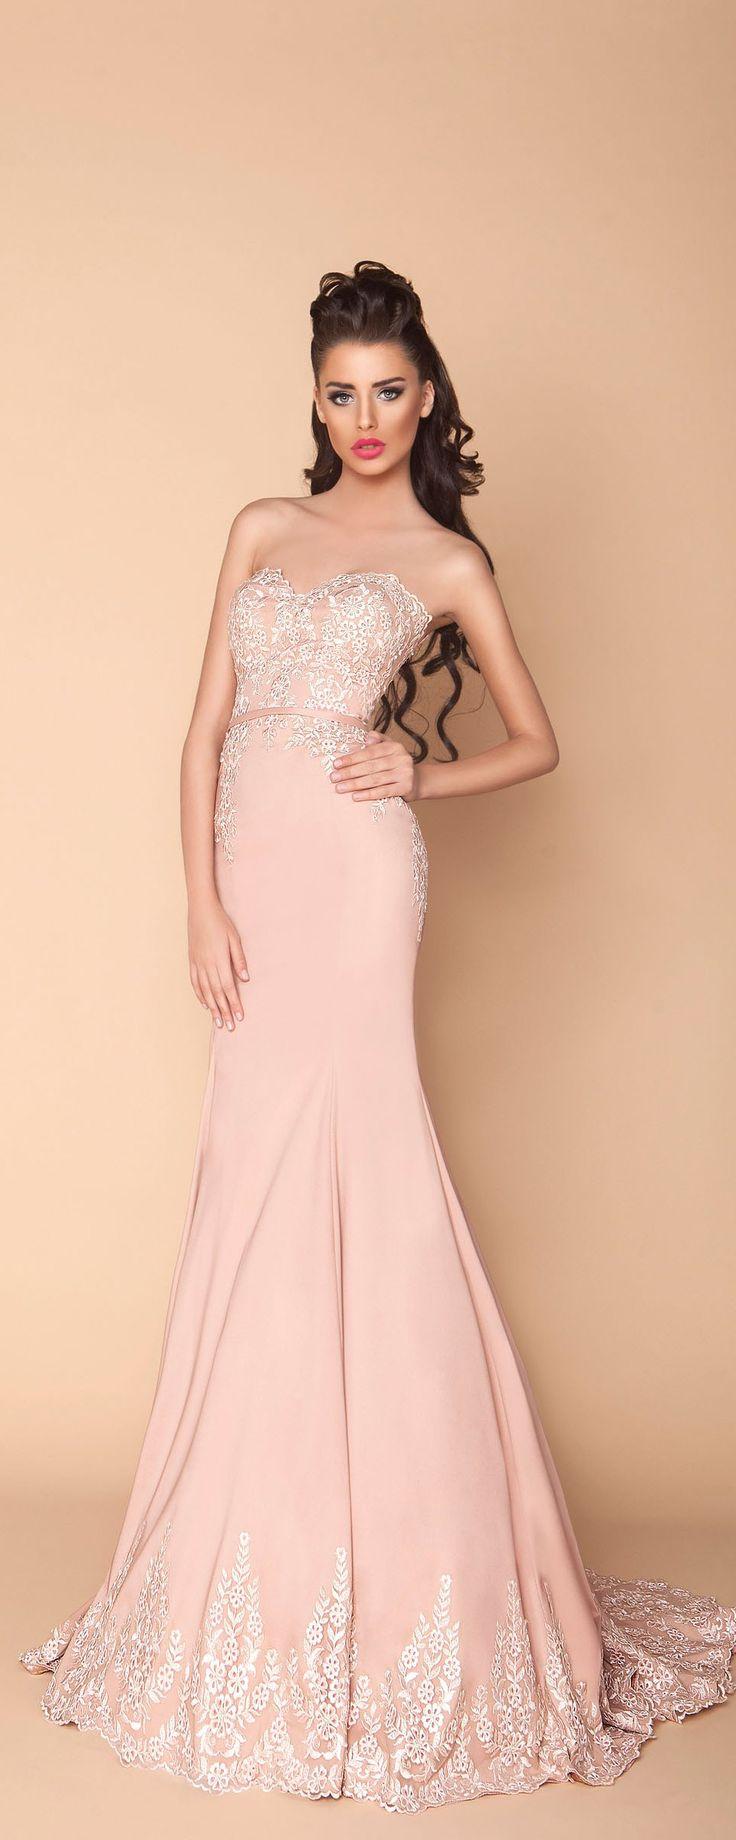 31 best Damas de honor images on Pinterest | Bridesmaids, Evening ...